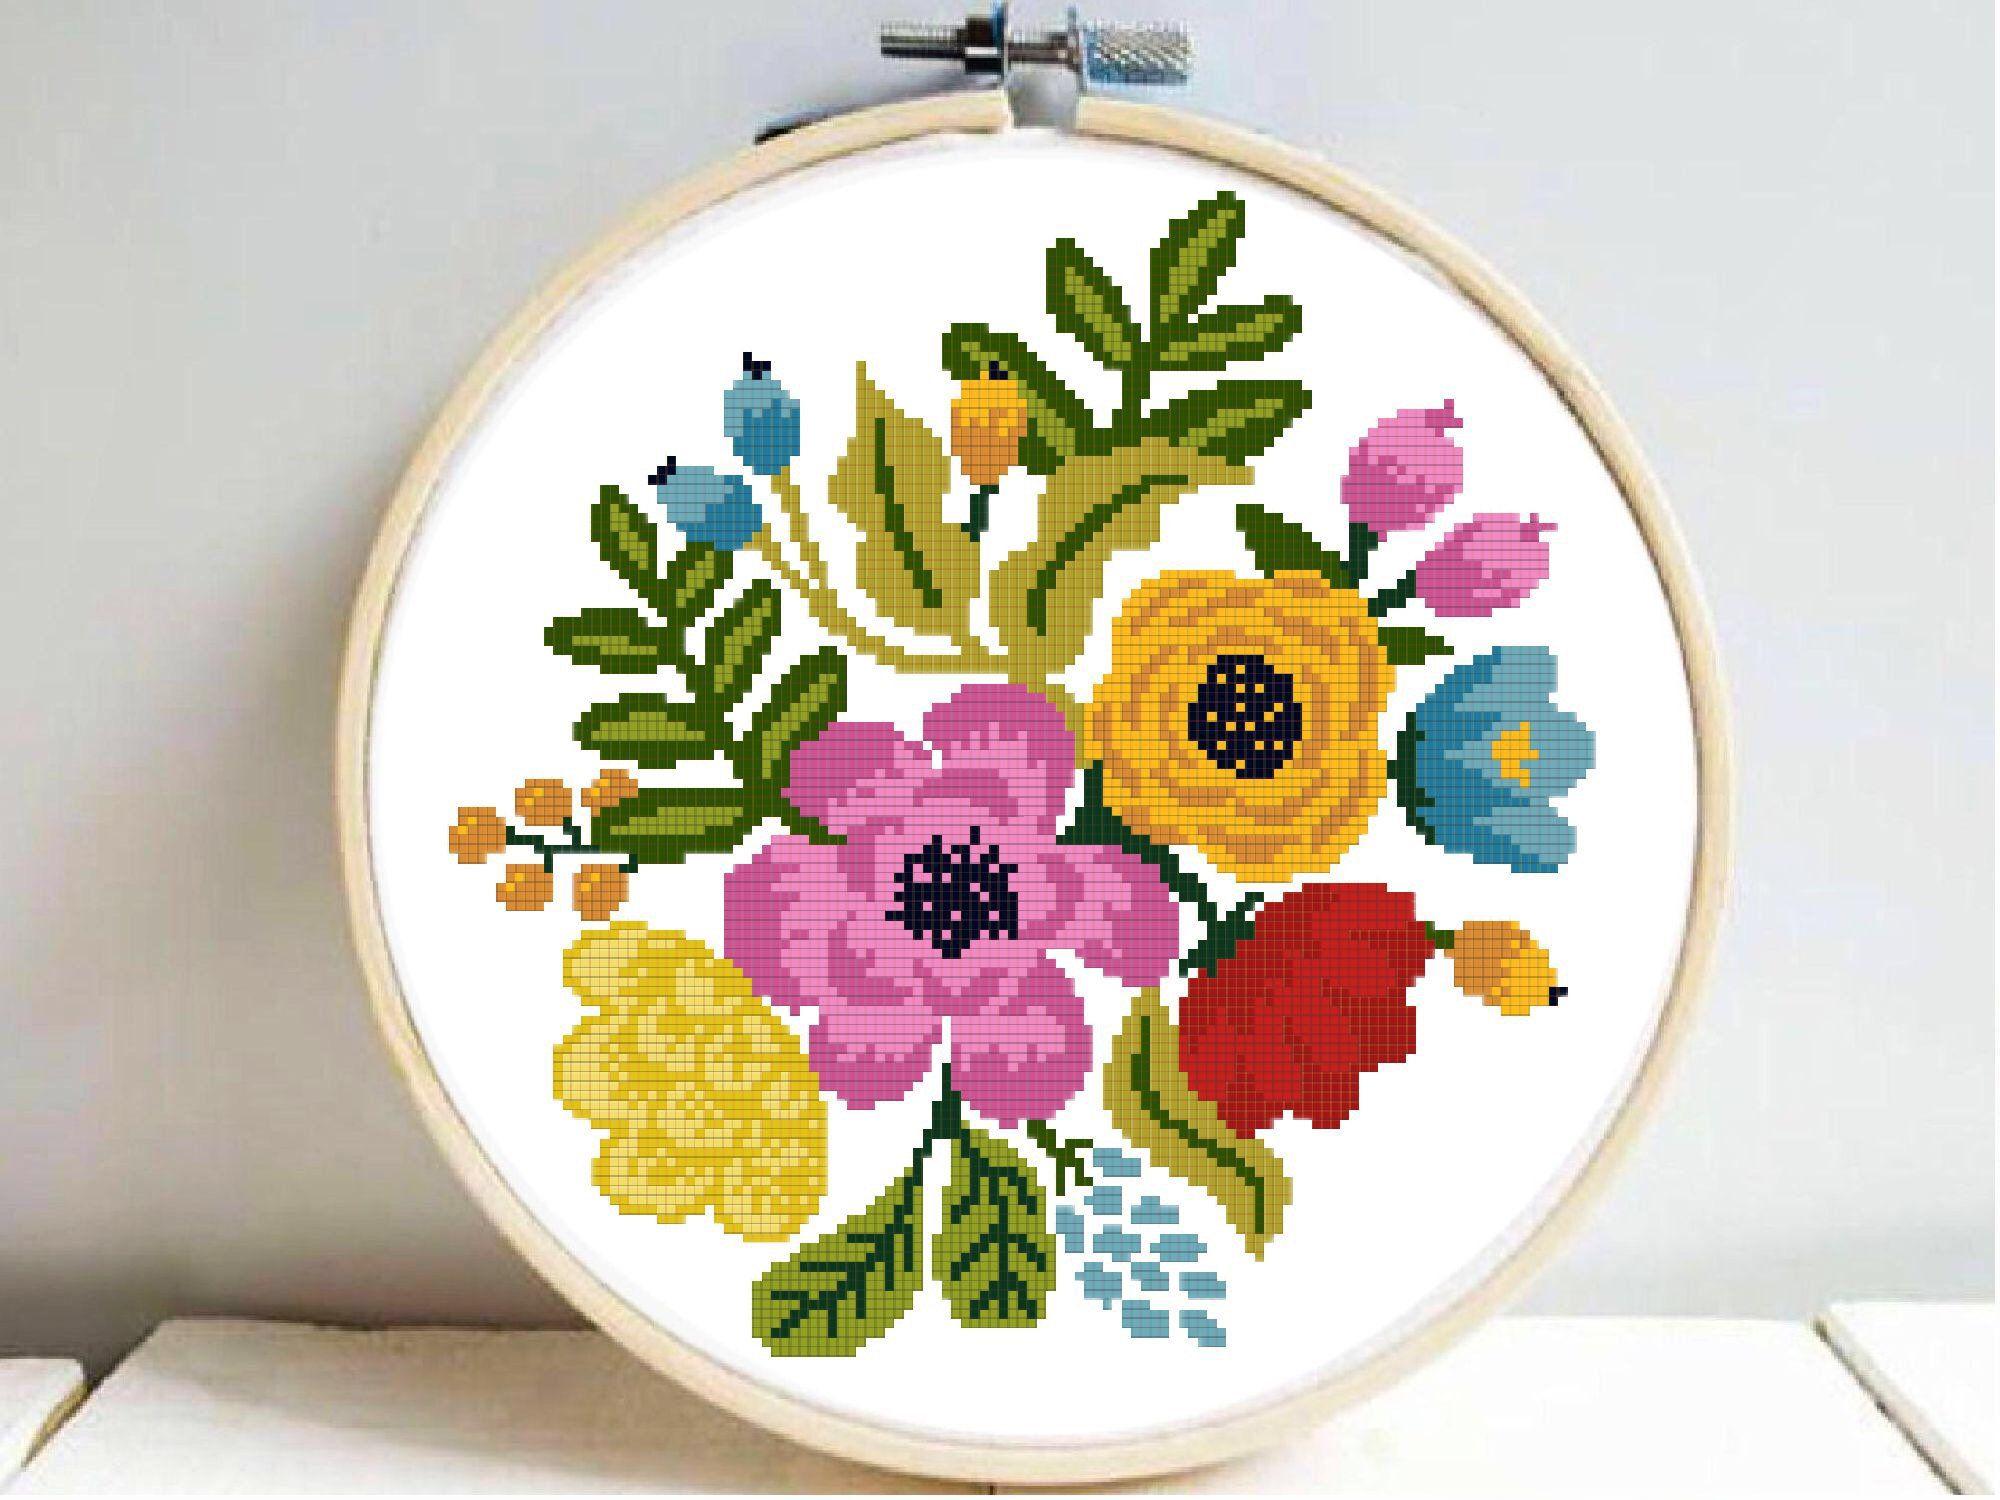 Cross Stitch Crafts For Beginner Needlework Handmade Arts DIY Embroidery Tools